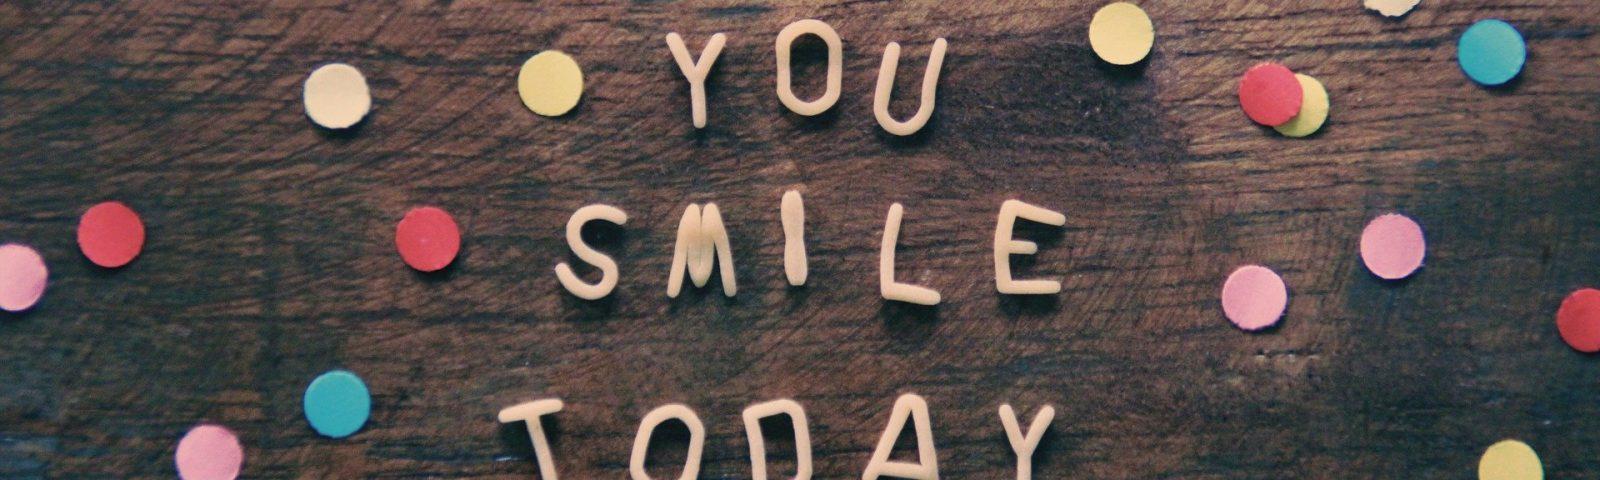 smile 5128742 1920